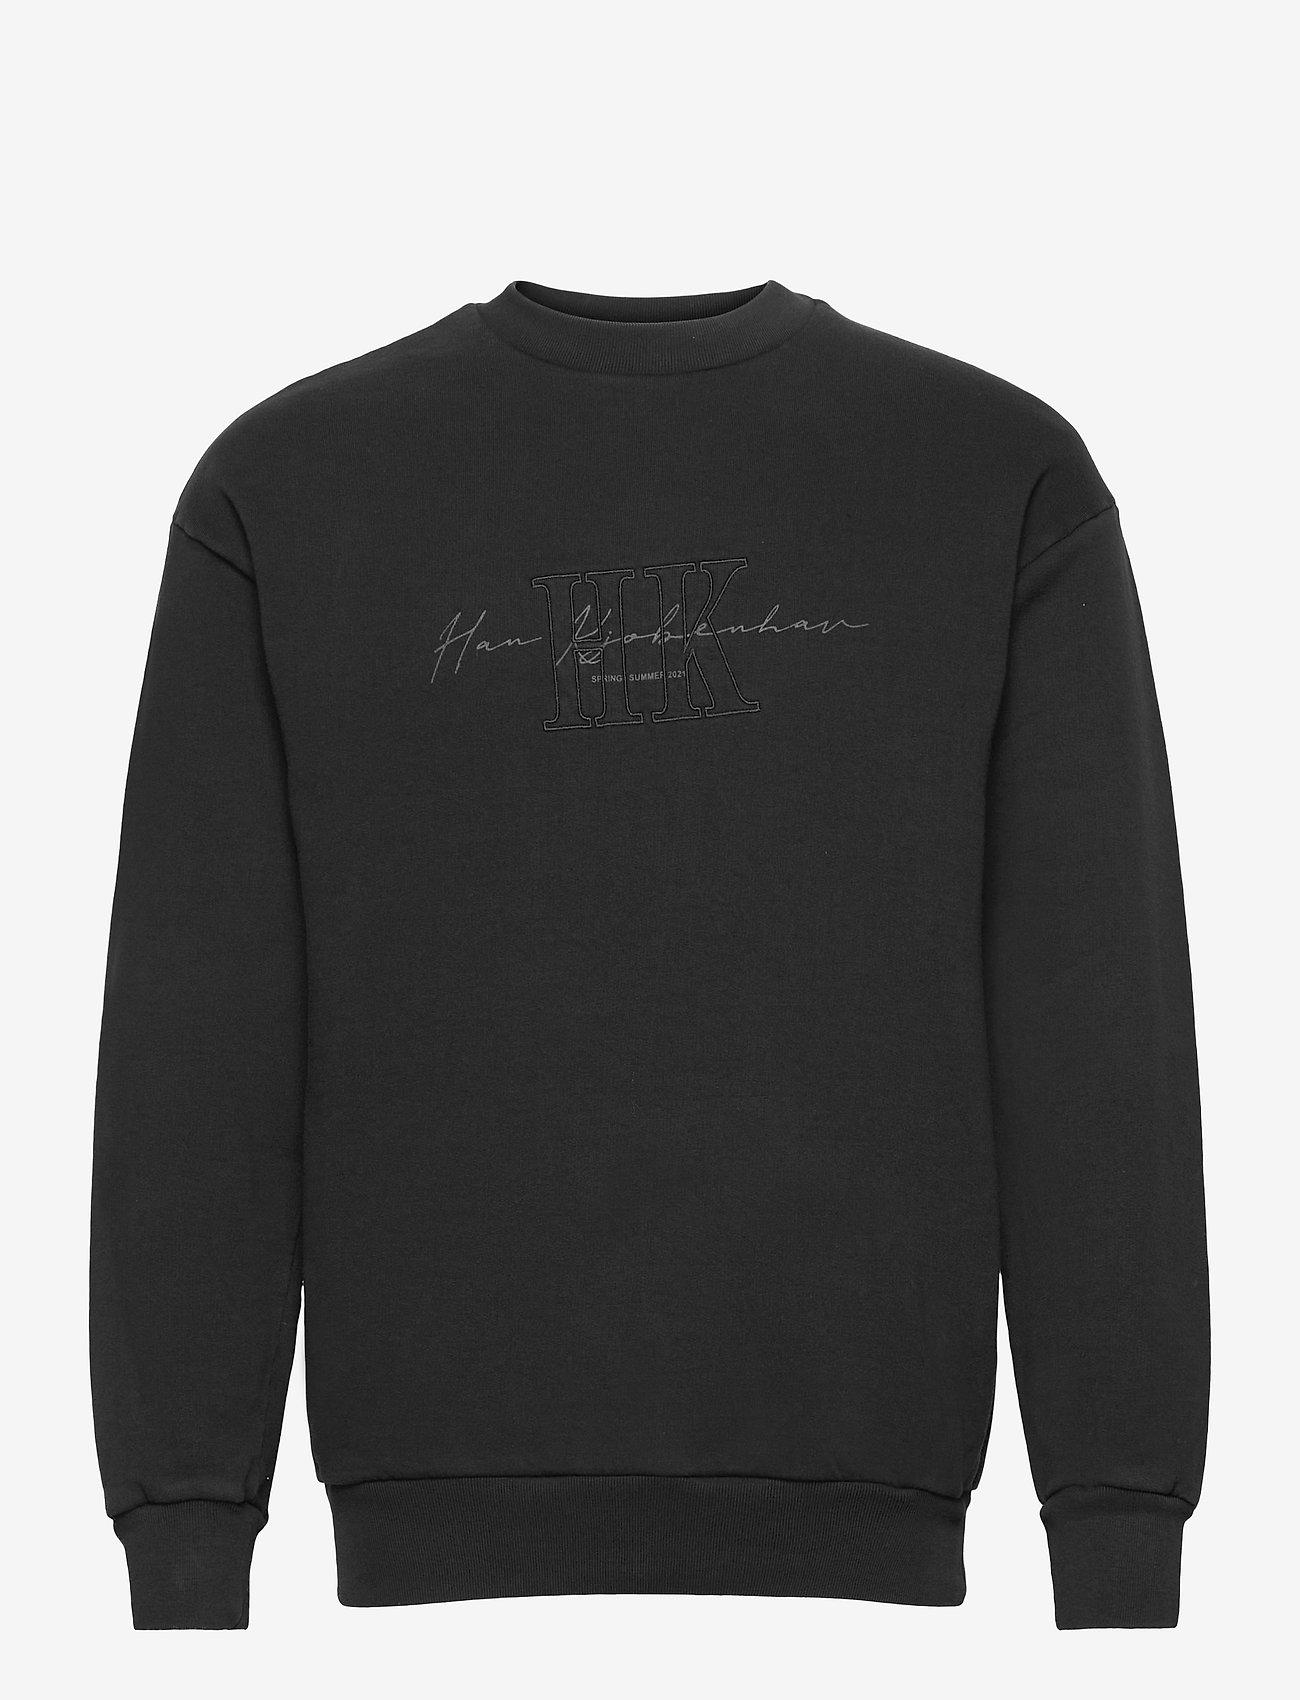 HAN Kjøbenhavn - Artwork Crew - truien - faded black hk - 0